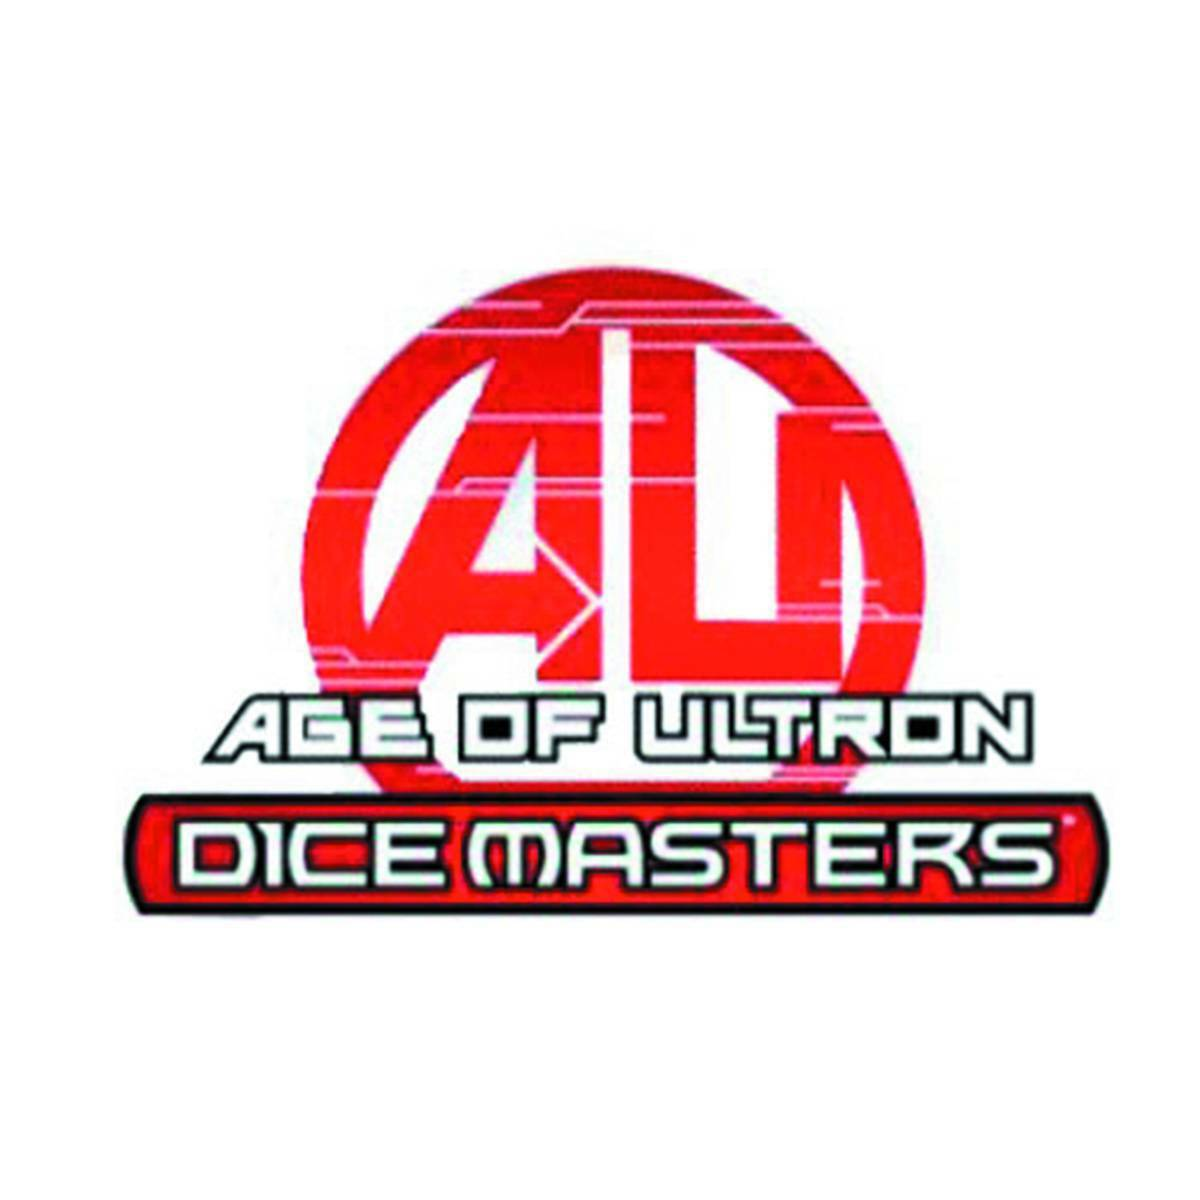 Marvel Dice Masters Complete C U R UR Set  s 1-142 Cards + Dice Age of Ultron ++